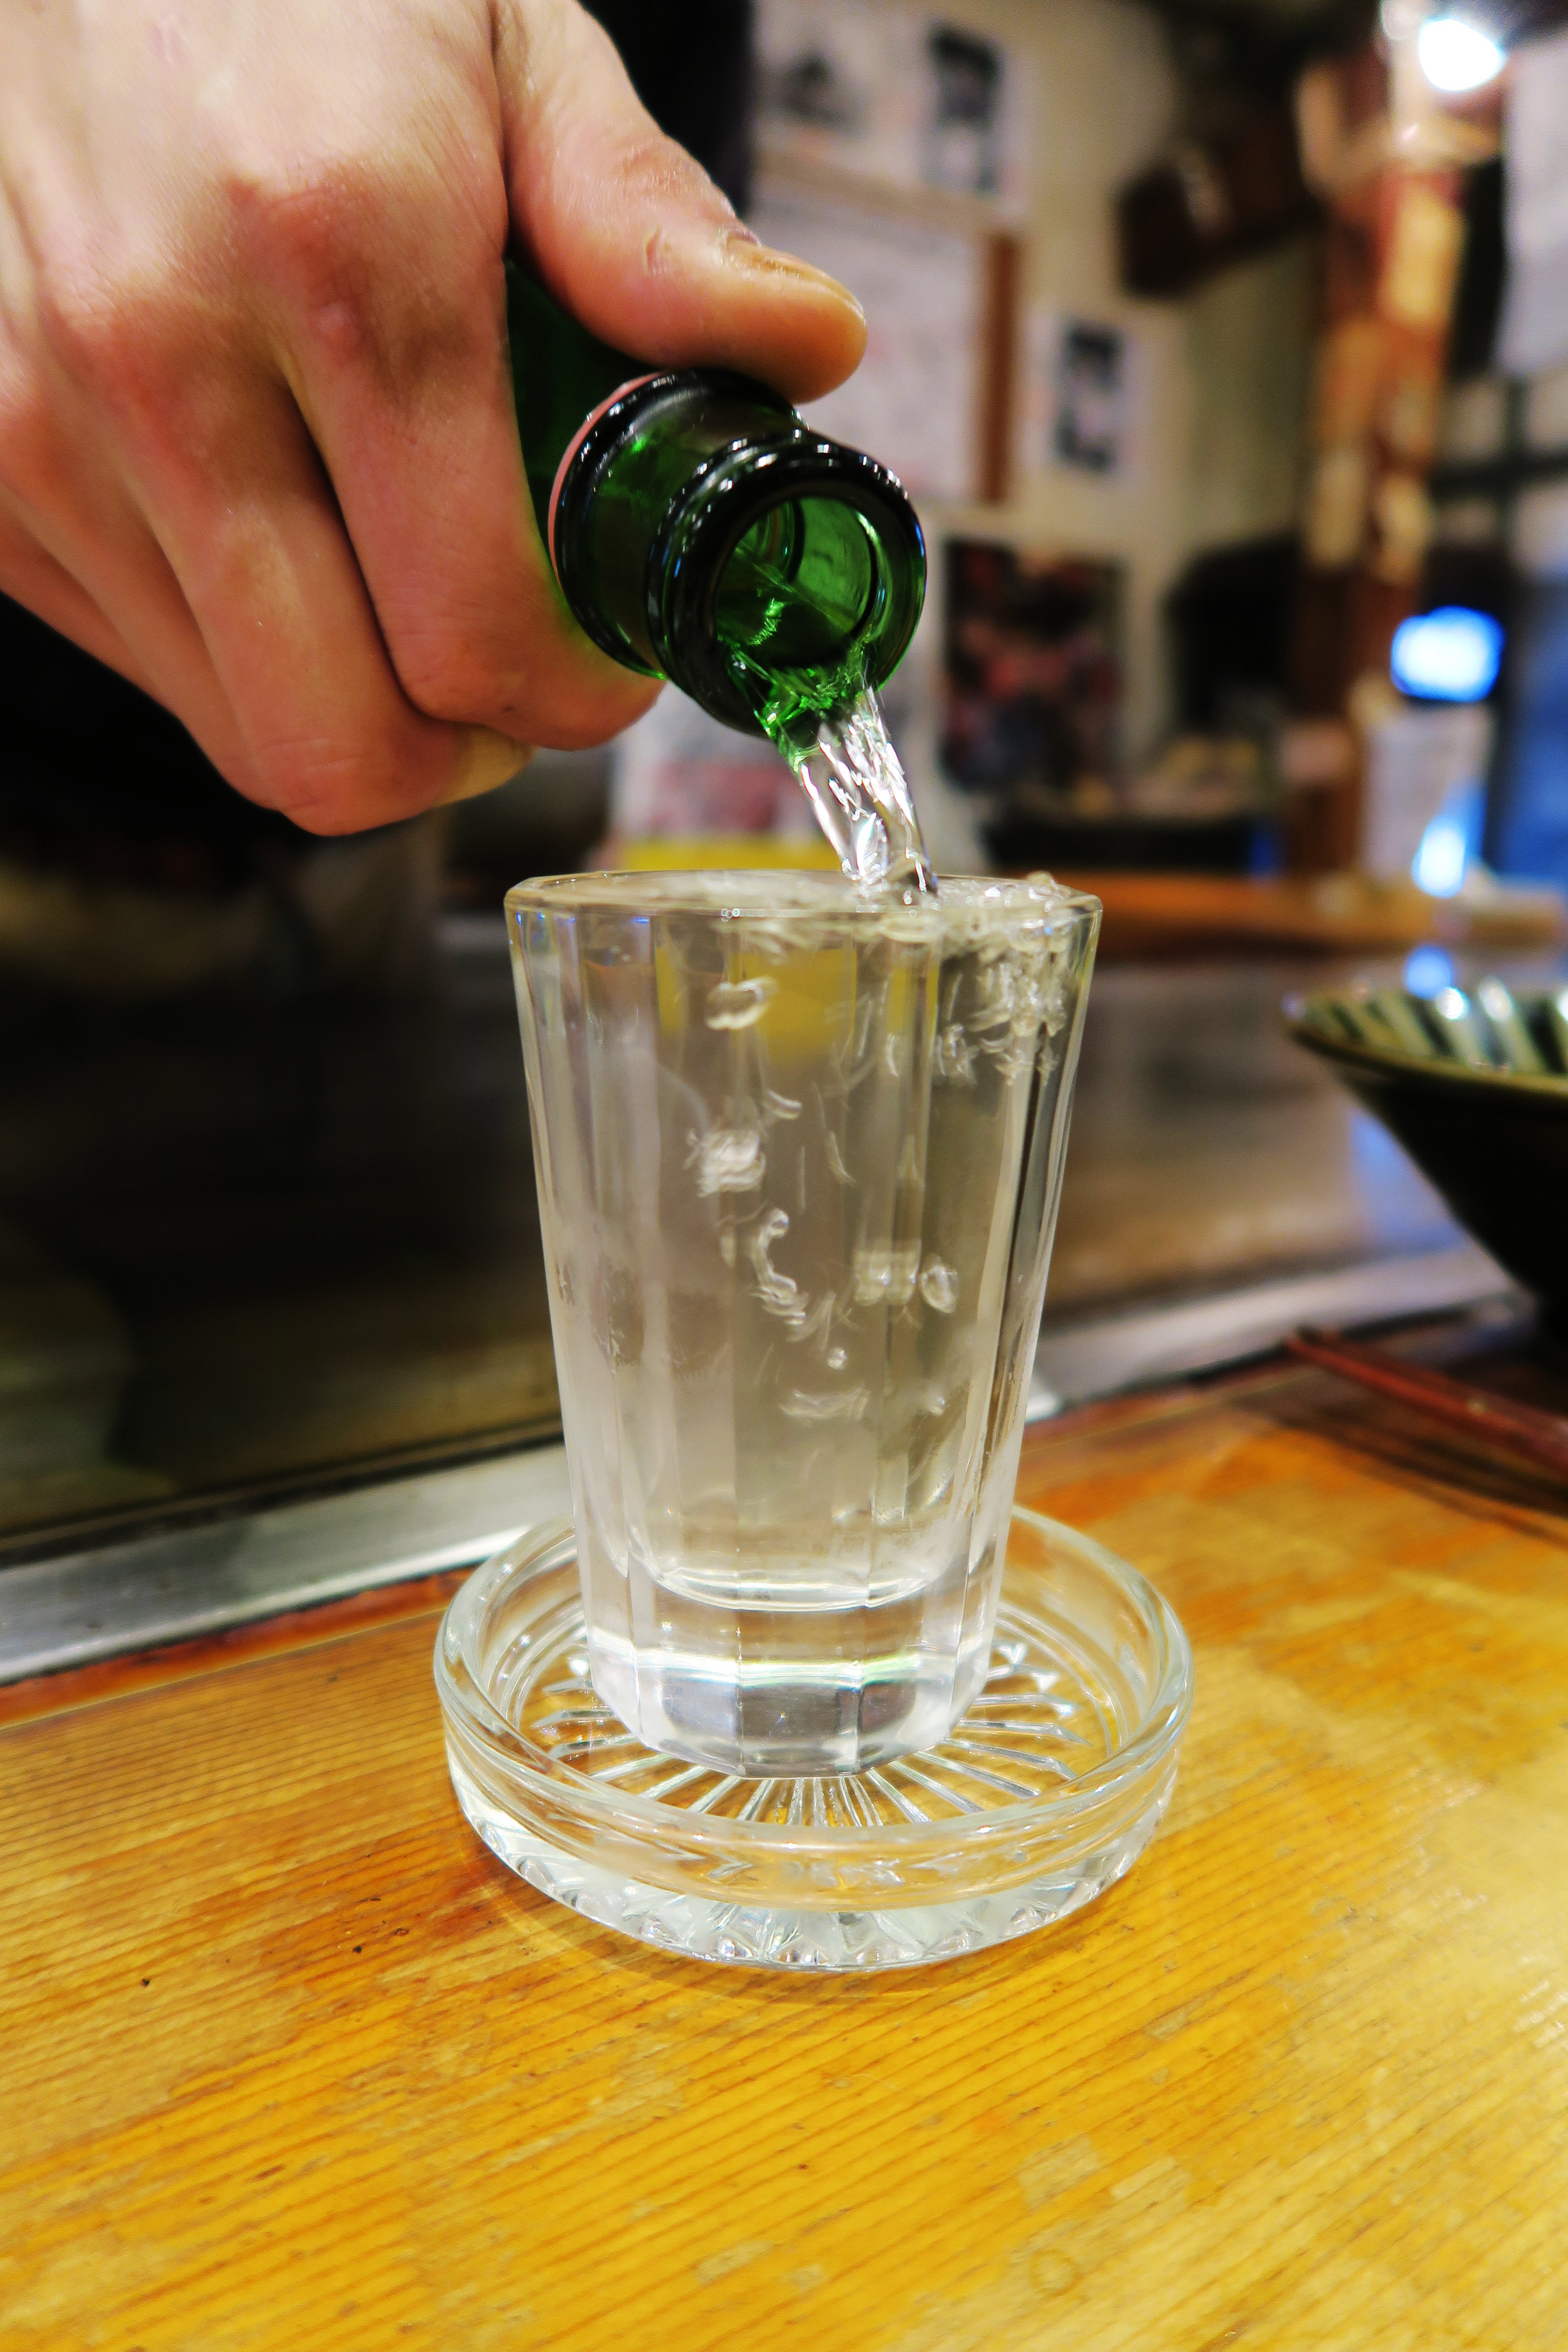 Bakawarai Kichijoji Izakaya overflowing cup of sake